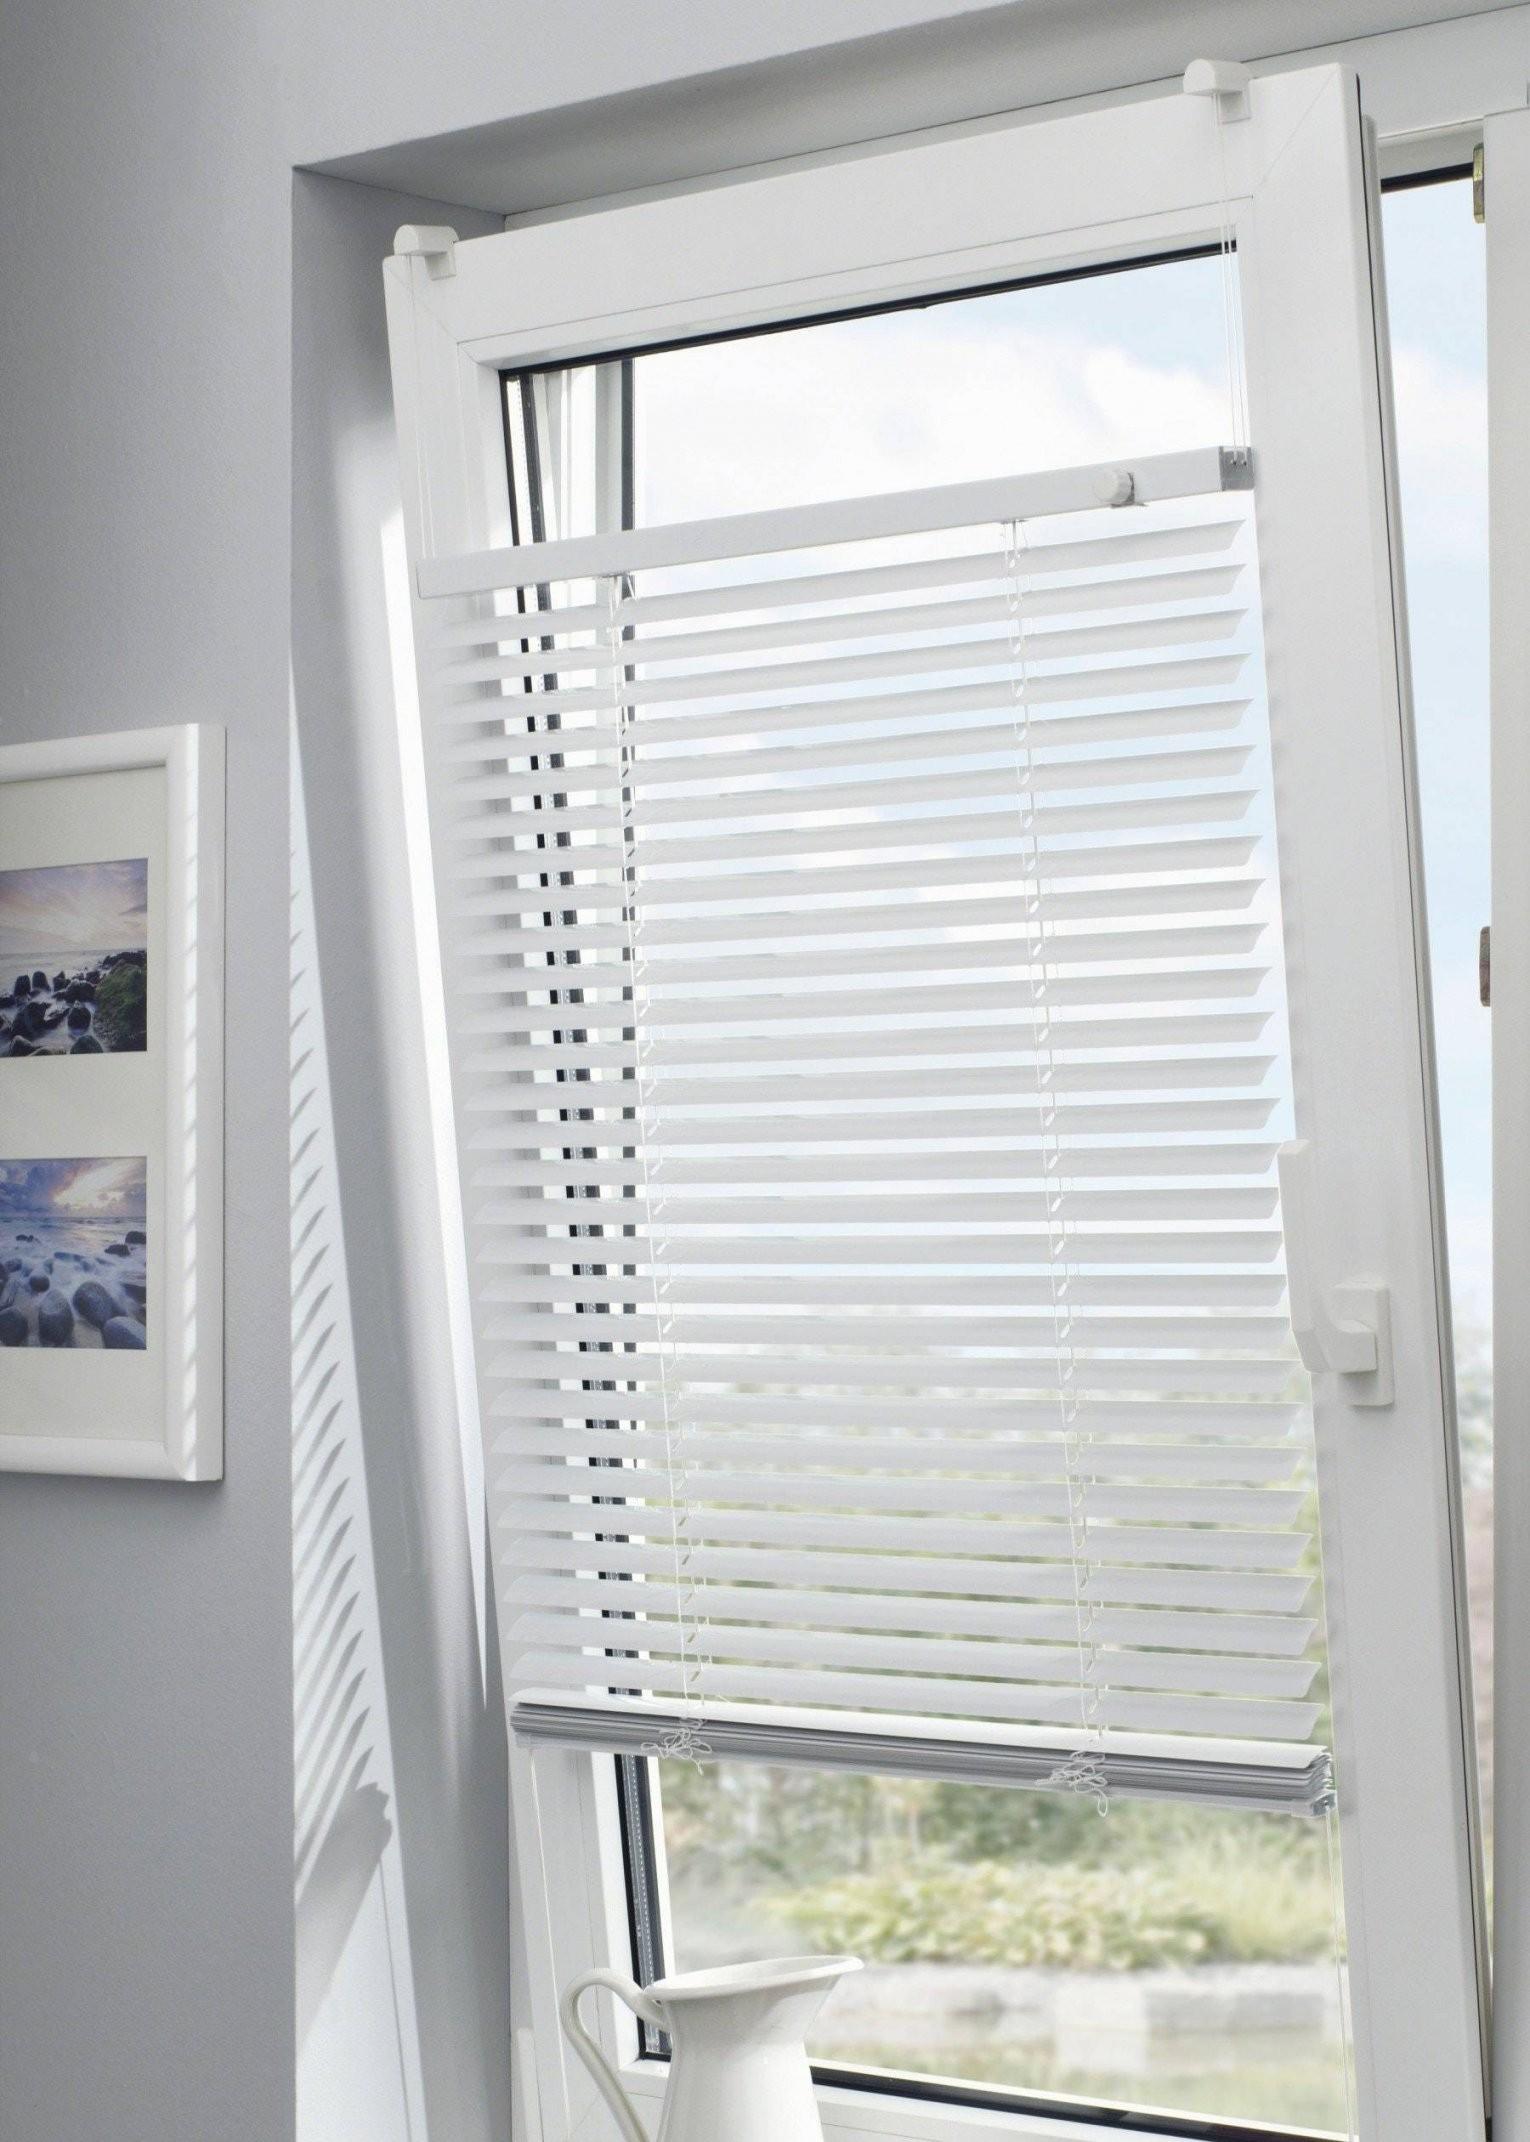 34 Genial Rollos Für Fenster Innen  Lapetitemaisonnyc von Rollos Für Fenster Innen Photo